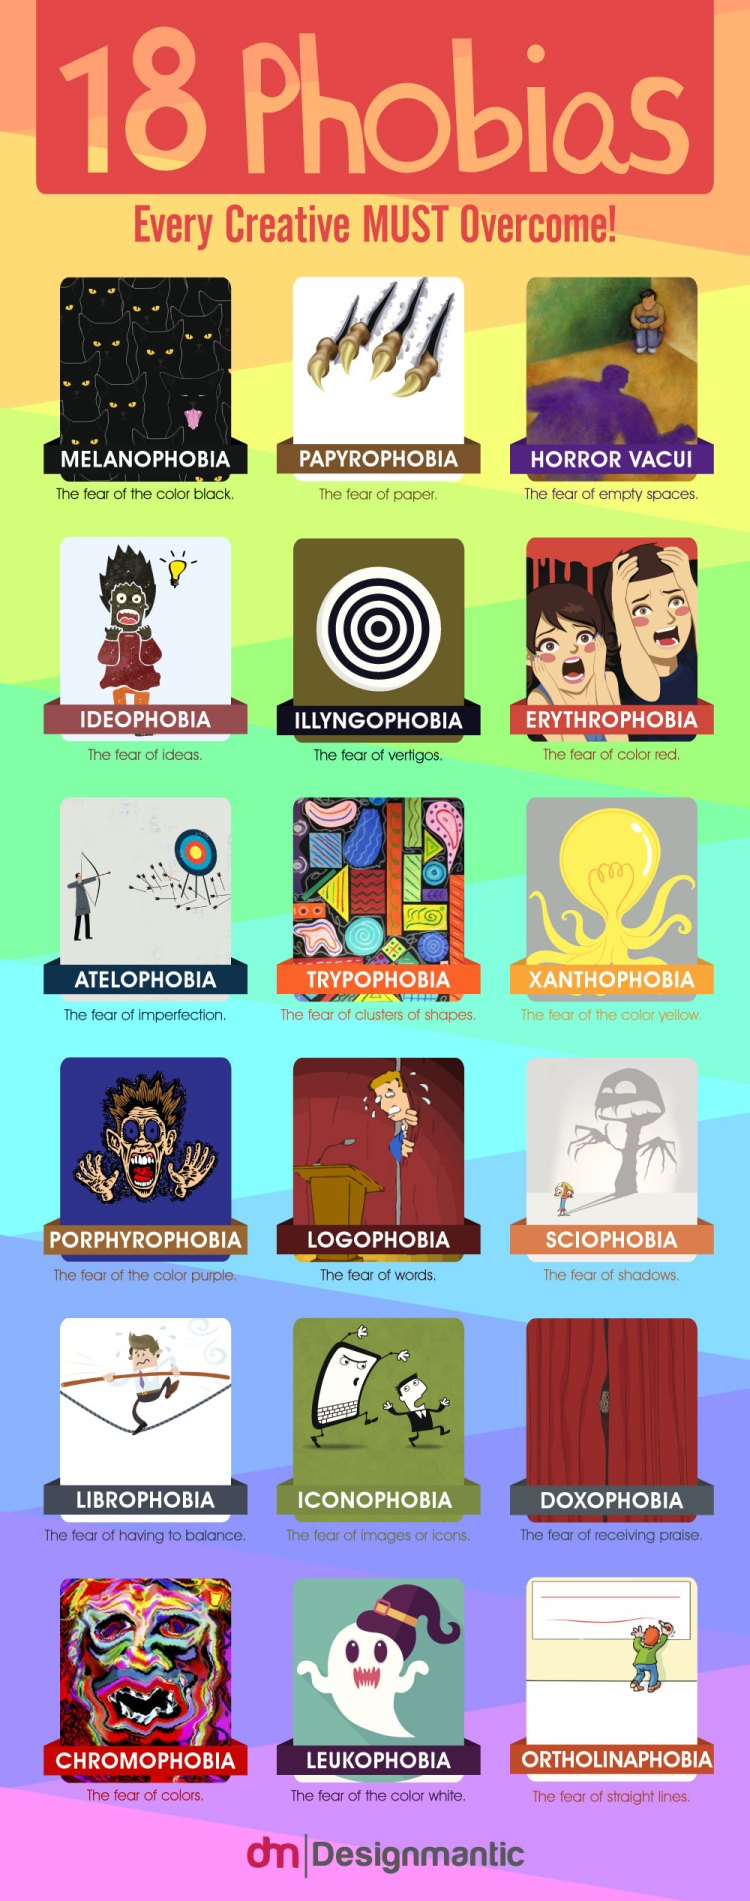 PhobiasCreativesMustOvercome_01